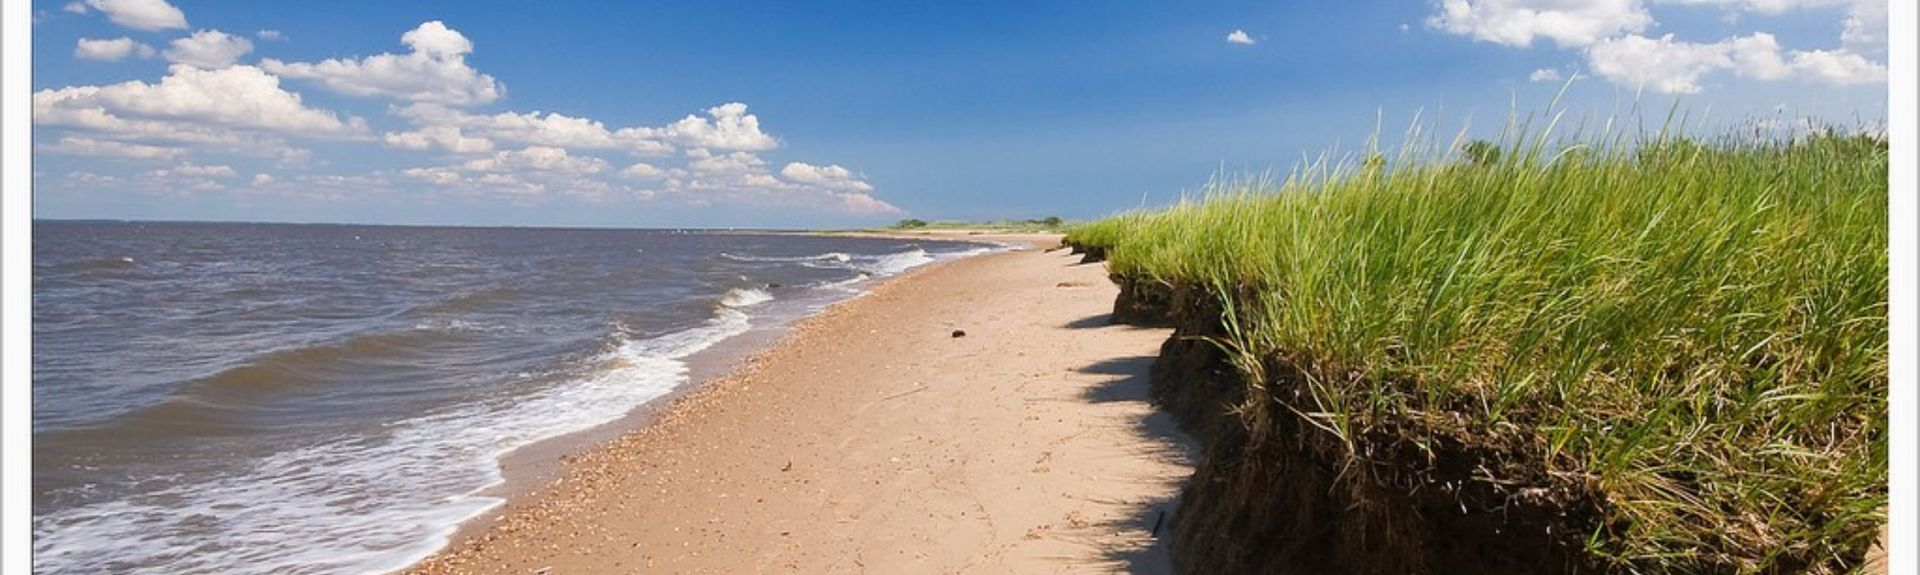 New Castle County, Delaware, United States of America